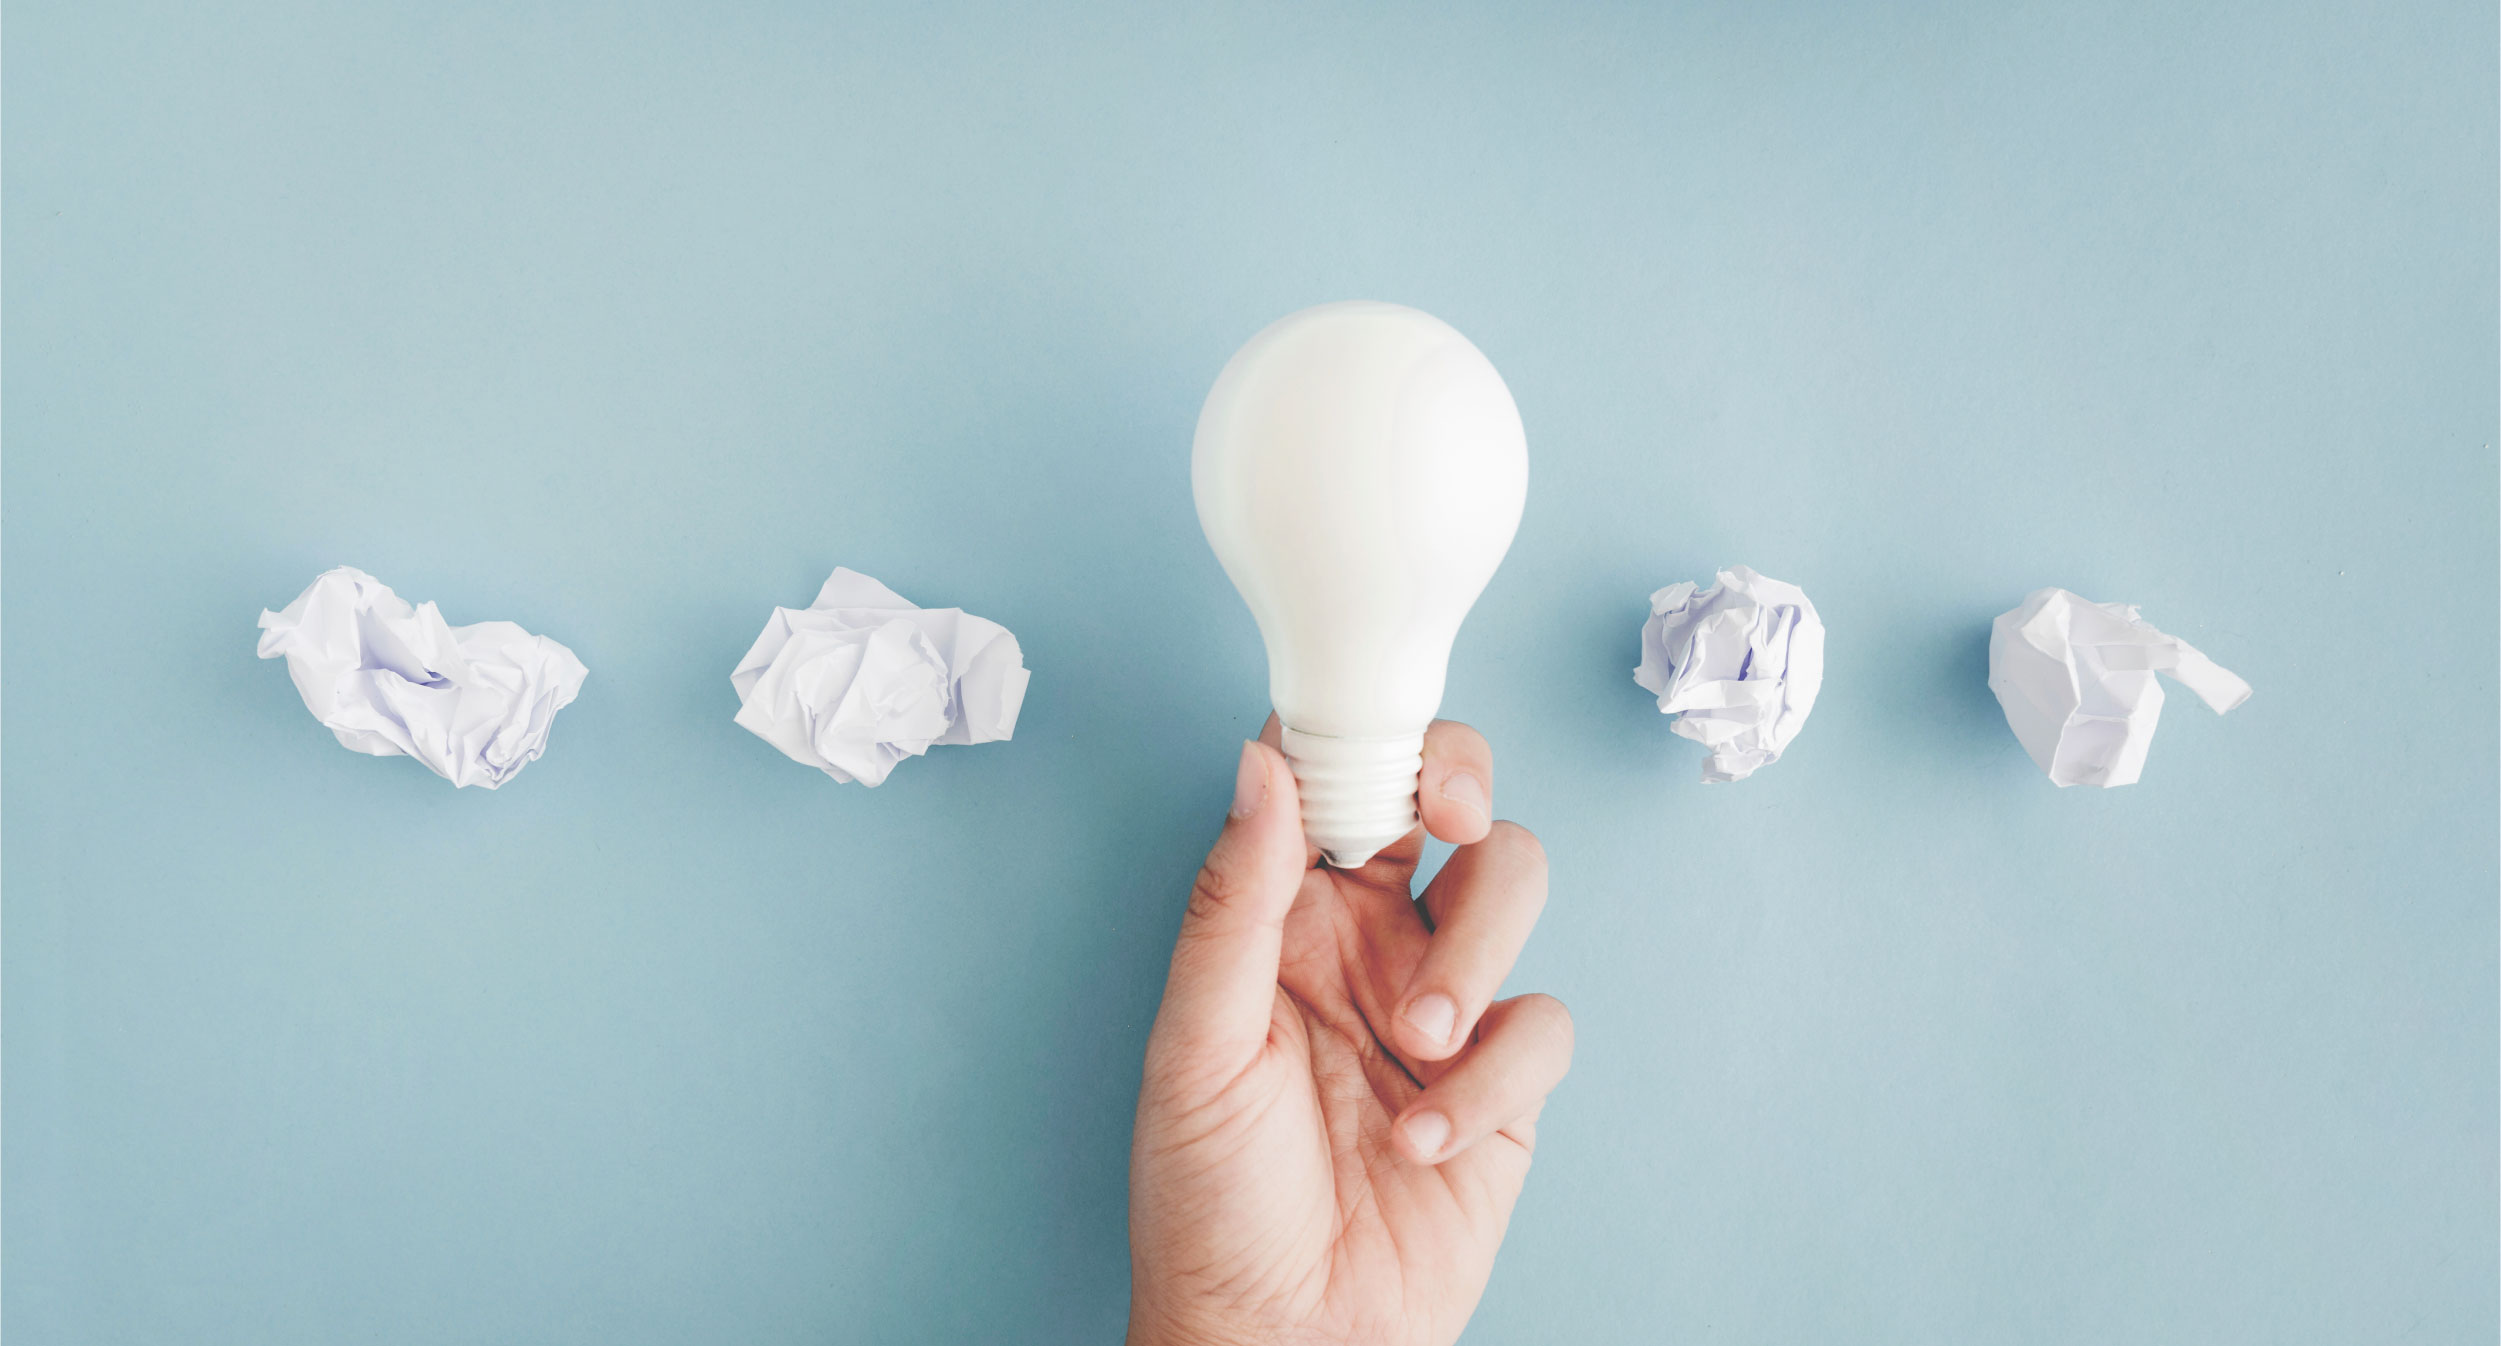 Idea problem solving | Botkeeper